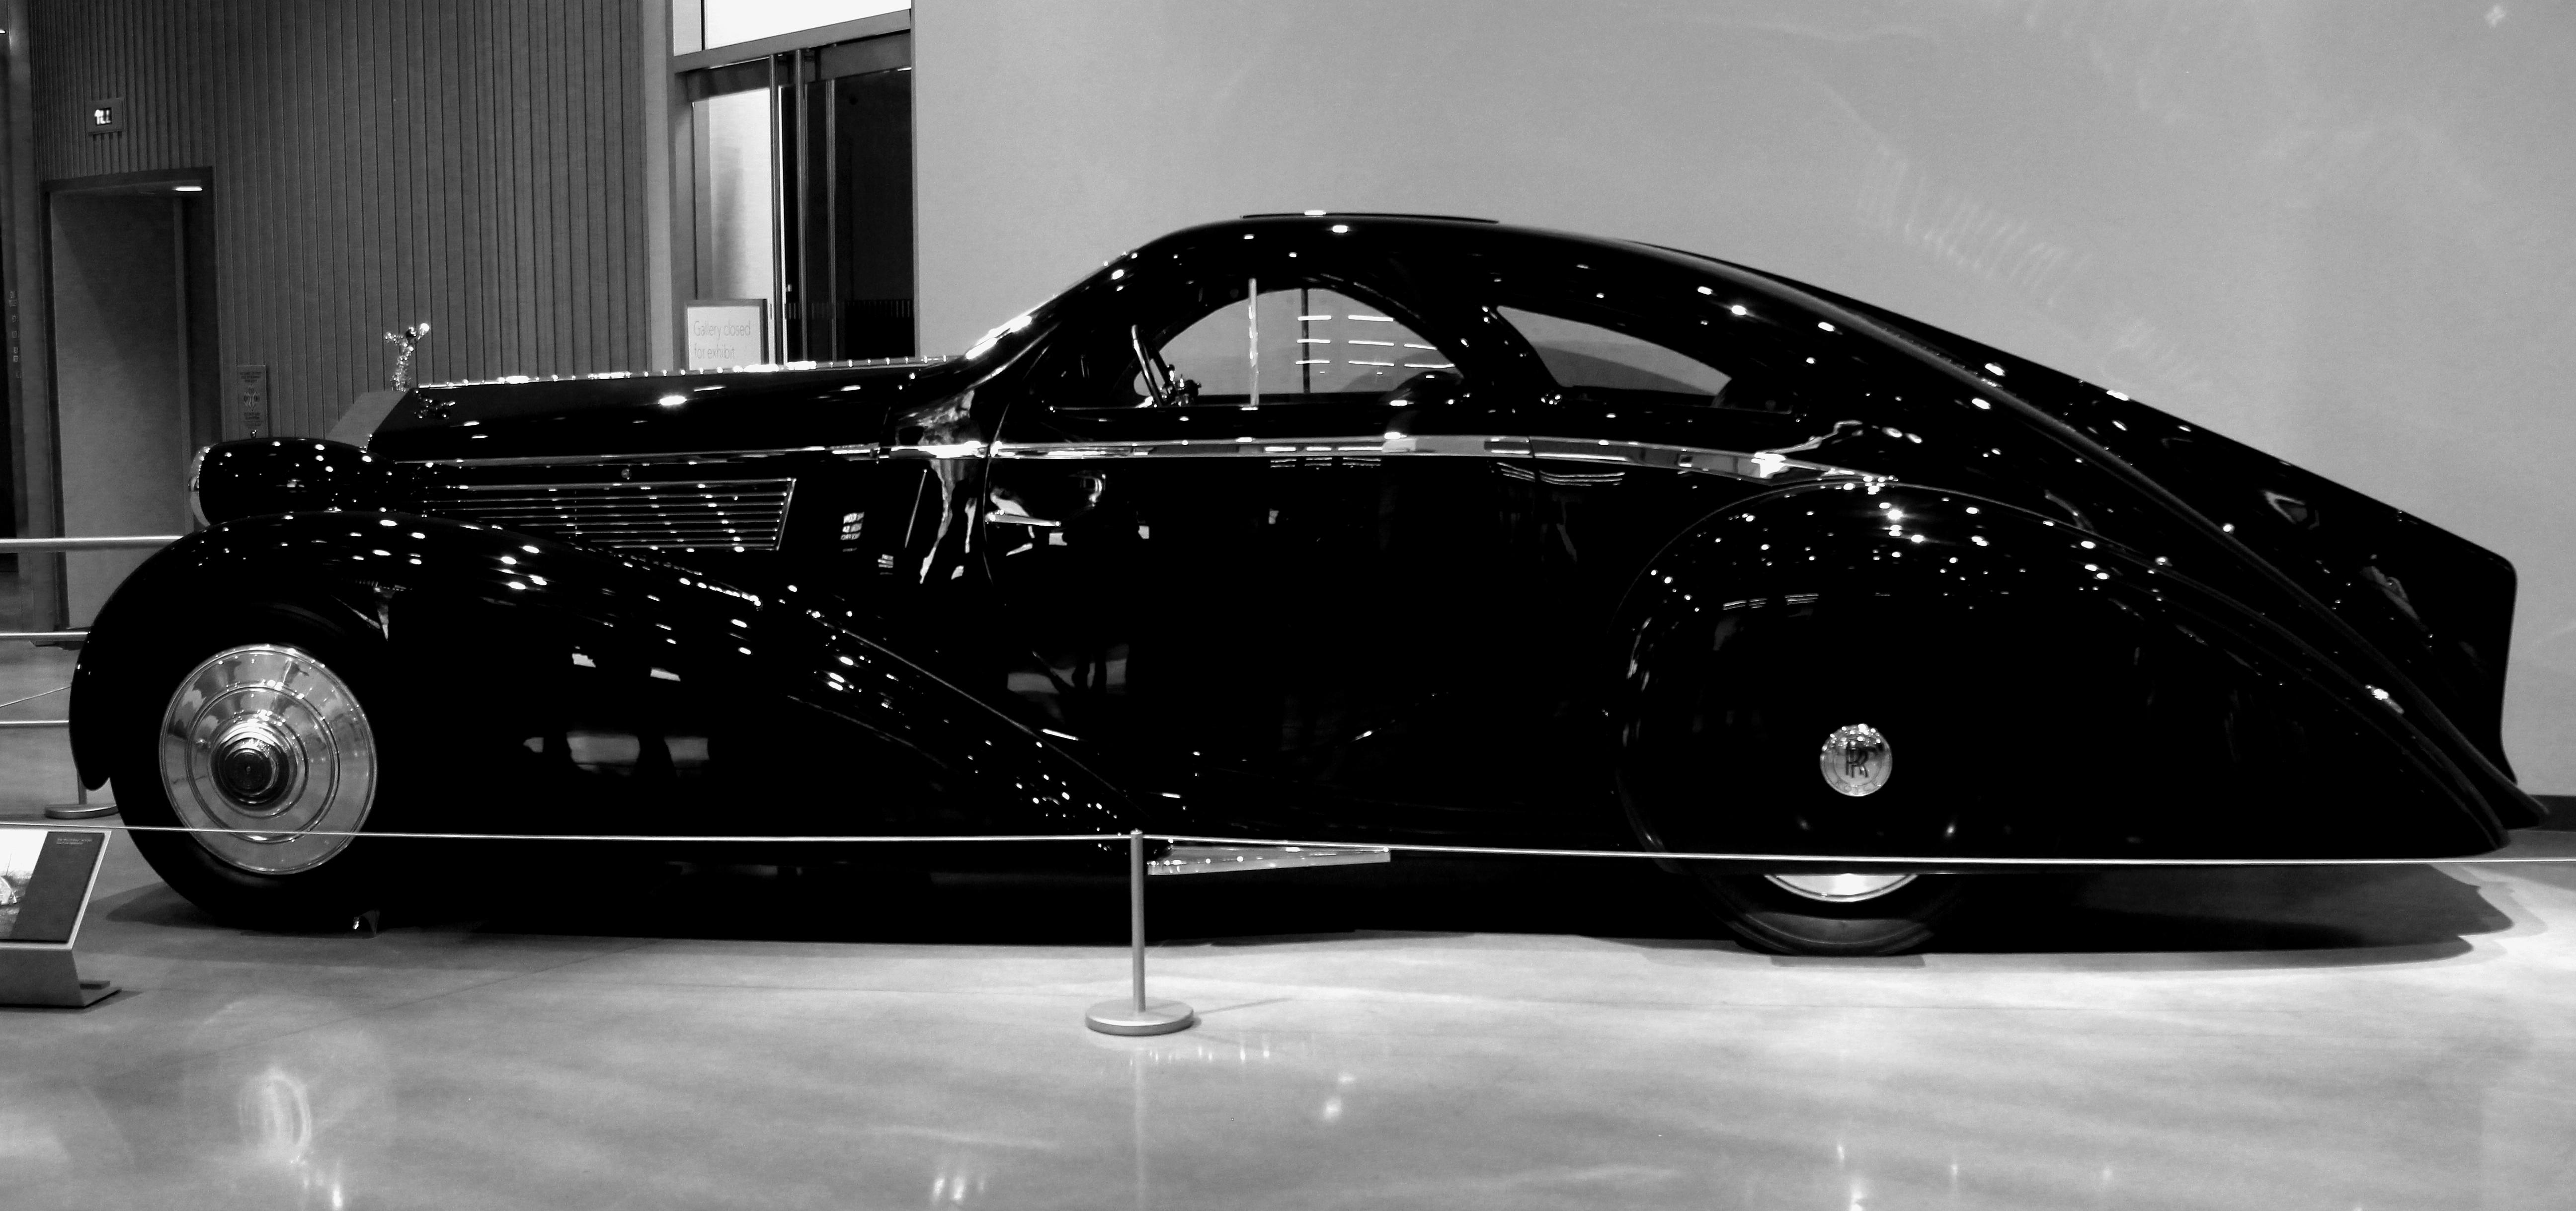 1925 Rolls Royce Phantom >> File 1925 Rolls Royce Phantom 1 31721577871 Jpg